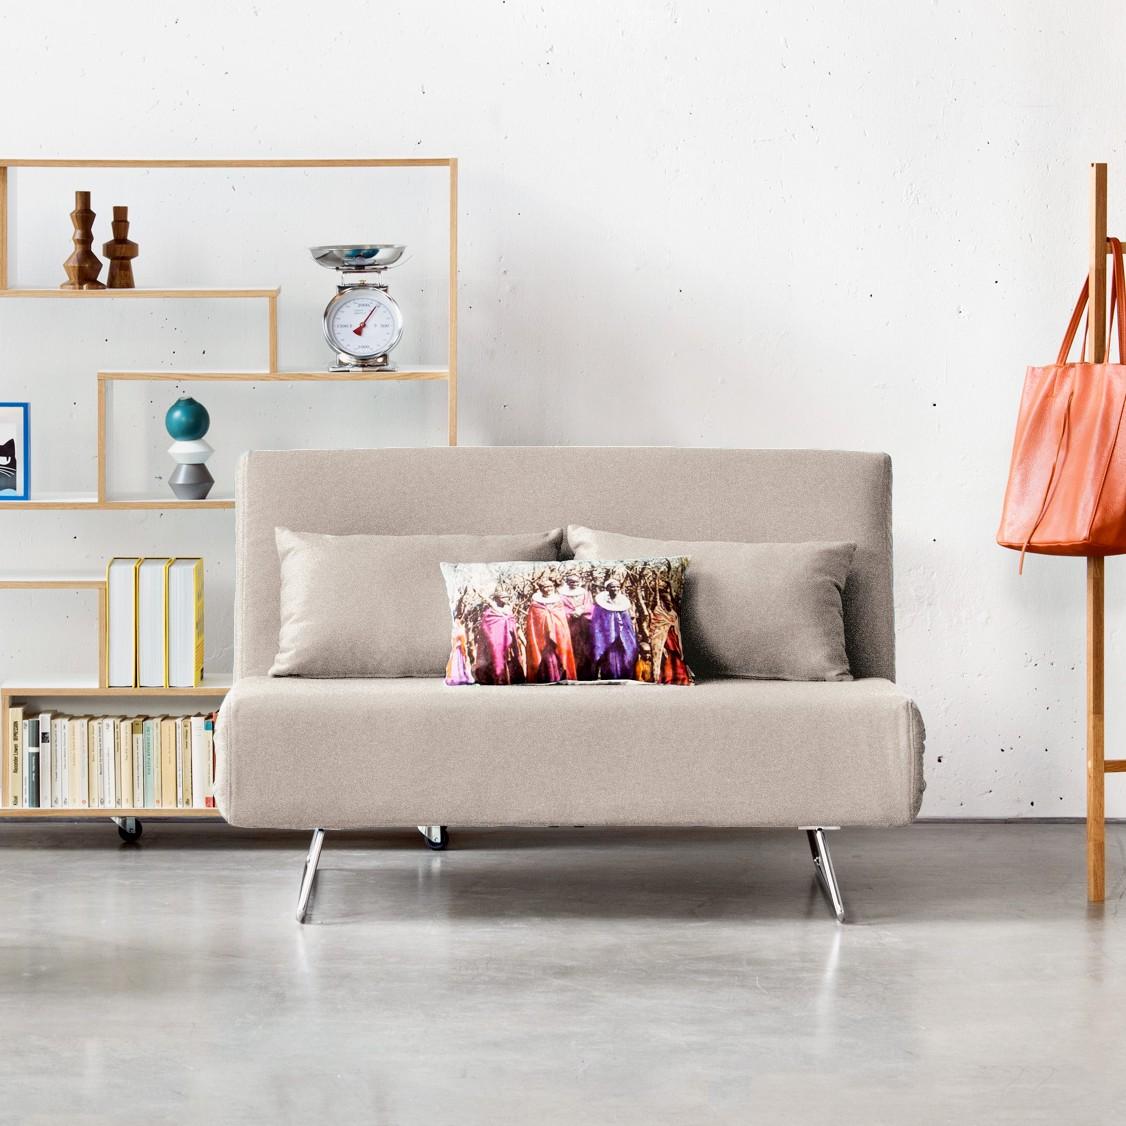 home24 Fredriks Schlafsofa Frizzo Beige-Grau Webstoff 136x82x87 cm mit Schlaffunktion